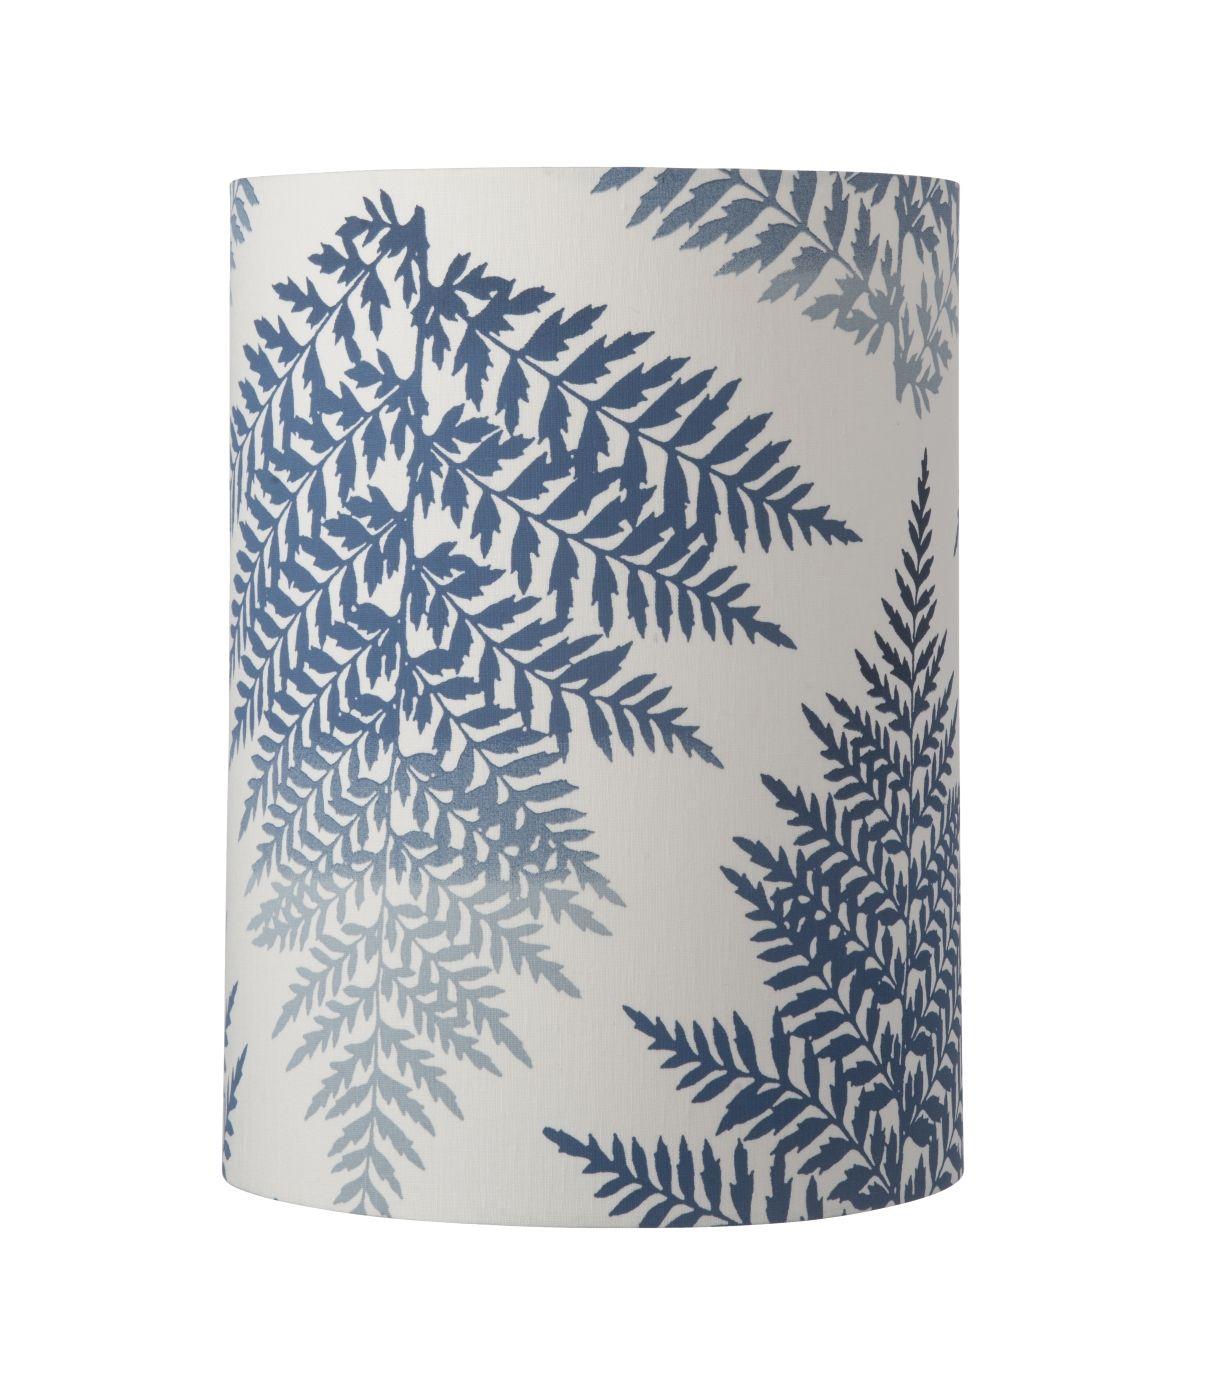 Ebb&Flow - Lampeskærm, fern leaves graphic, indigo, Ø30